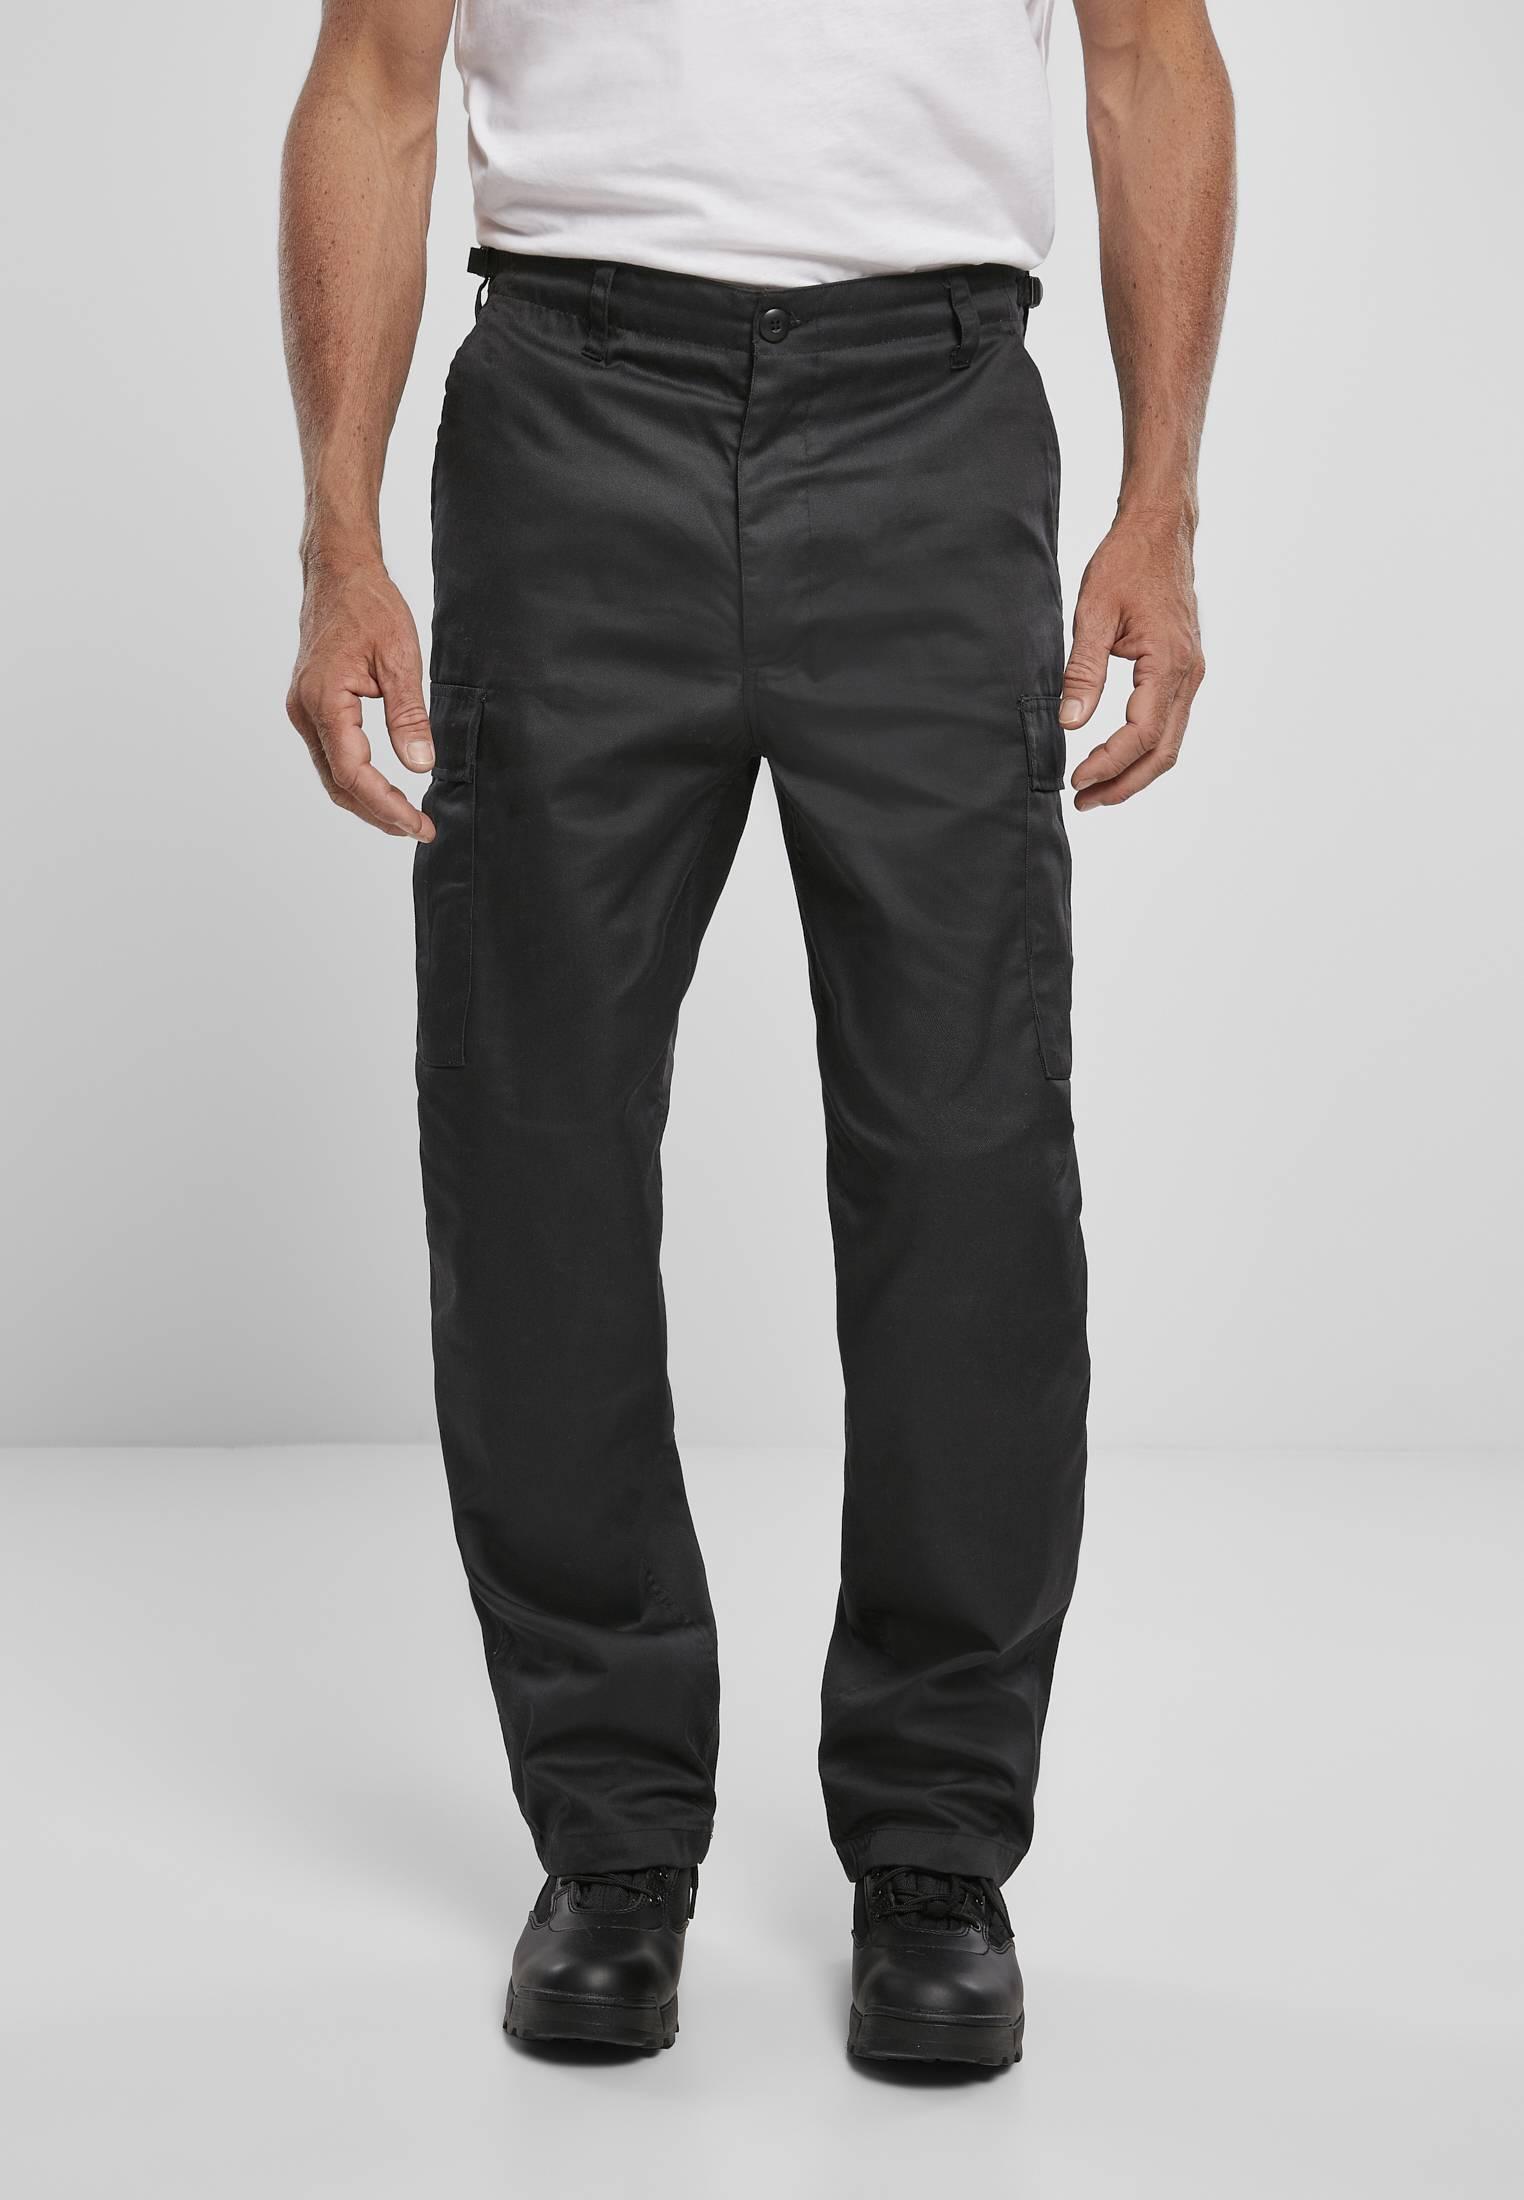 Urban Classics Brandit US Ranger Cargo Pants black - 5XL